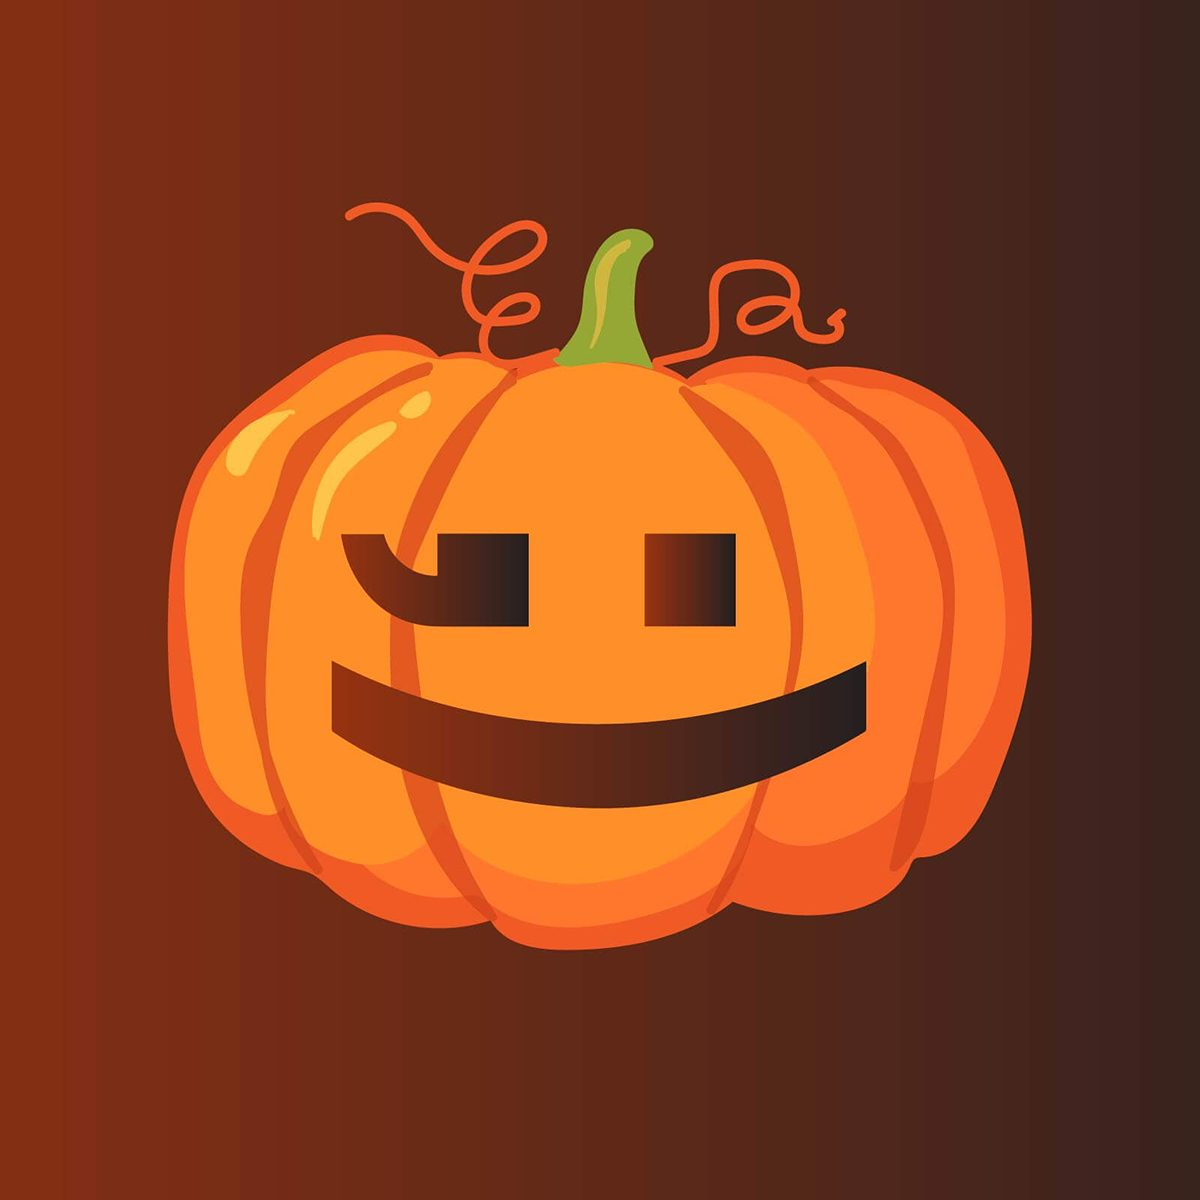 31 Free Pumpkin Carving Stencils To Take Your Jack O Lantern